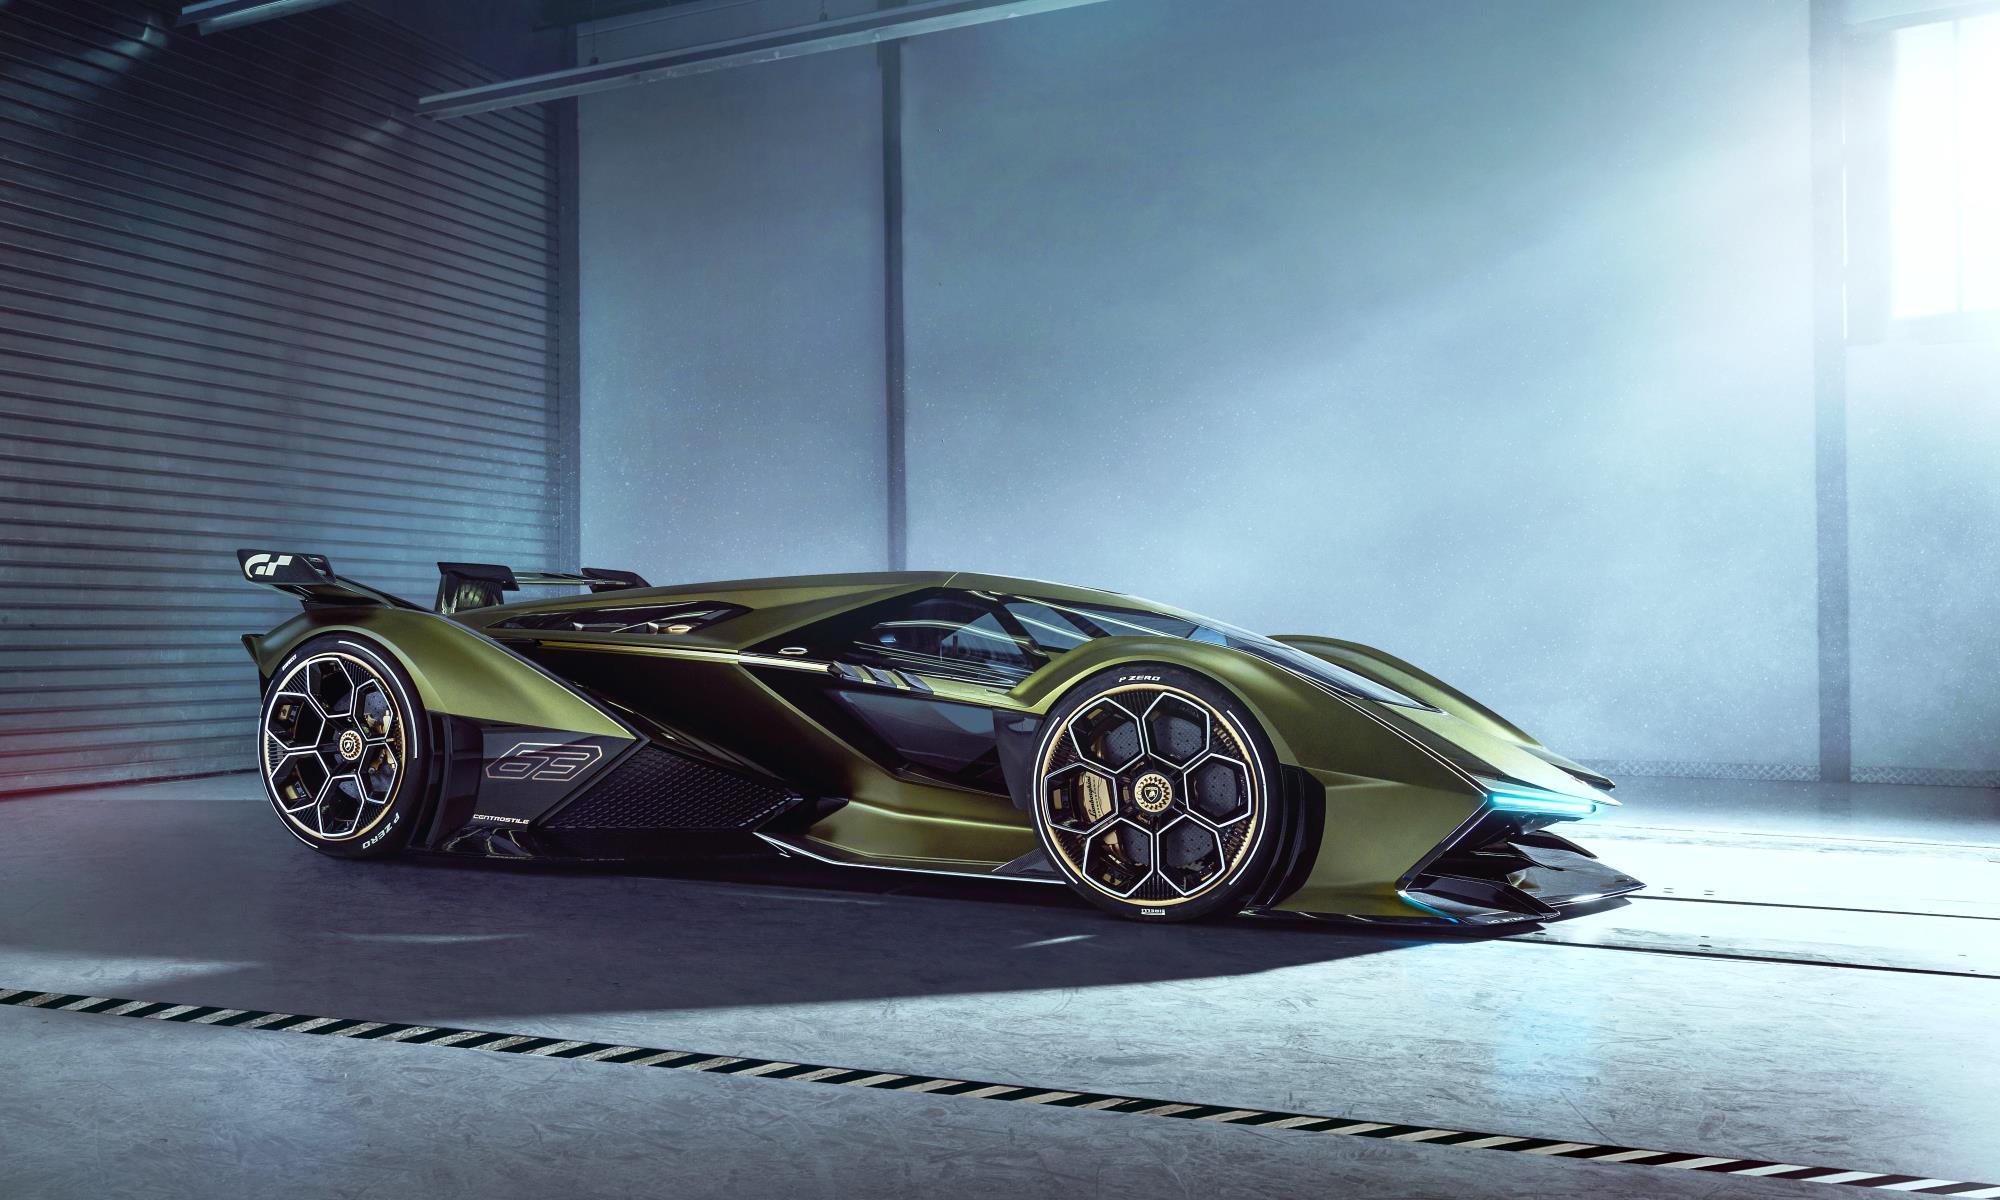 Lambo V12 Vision GT side